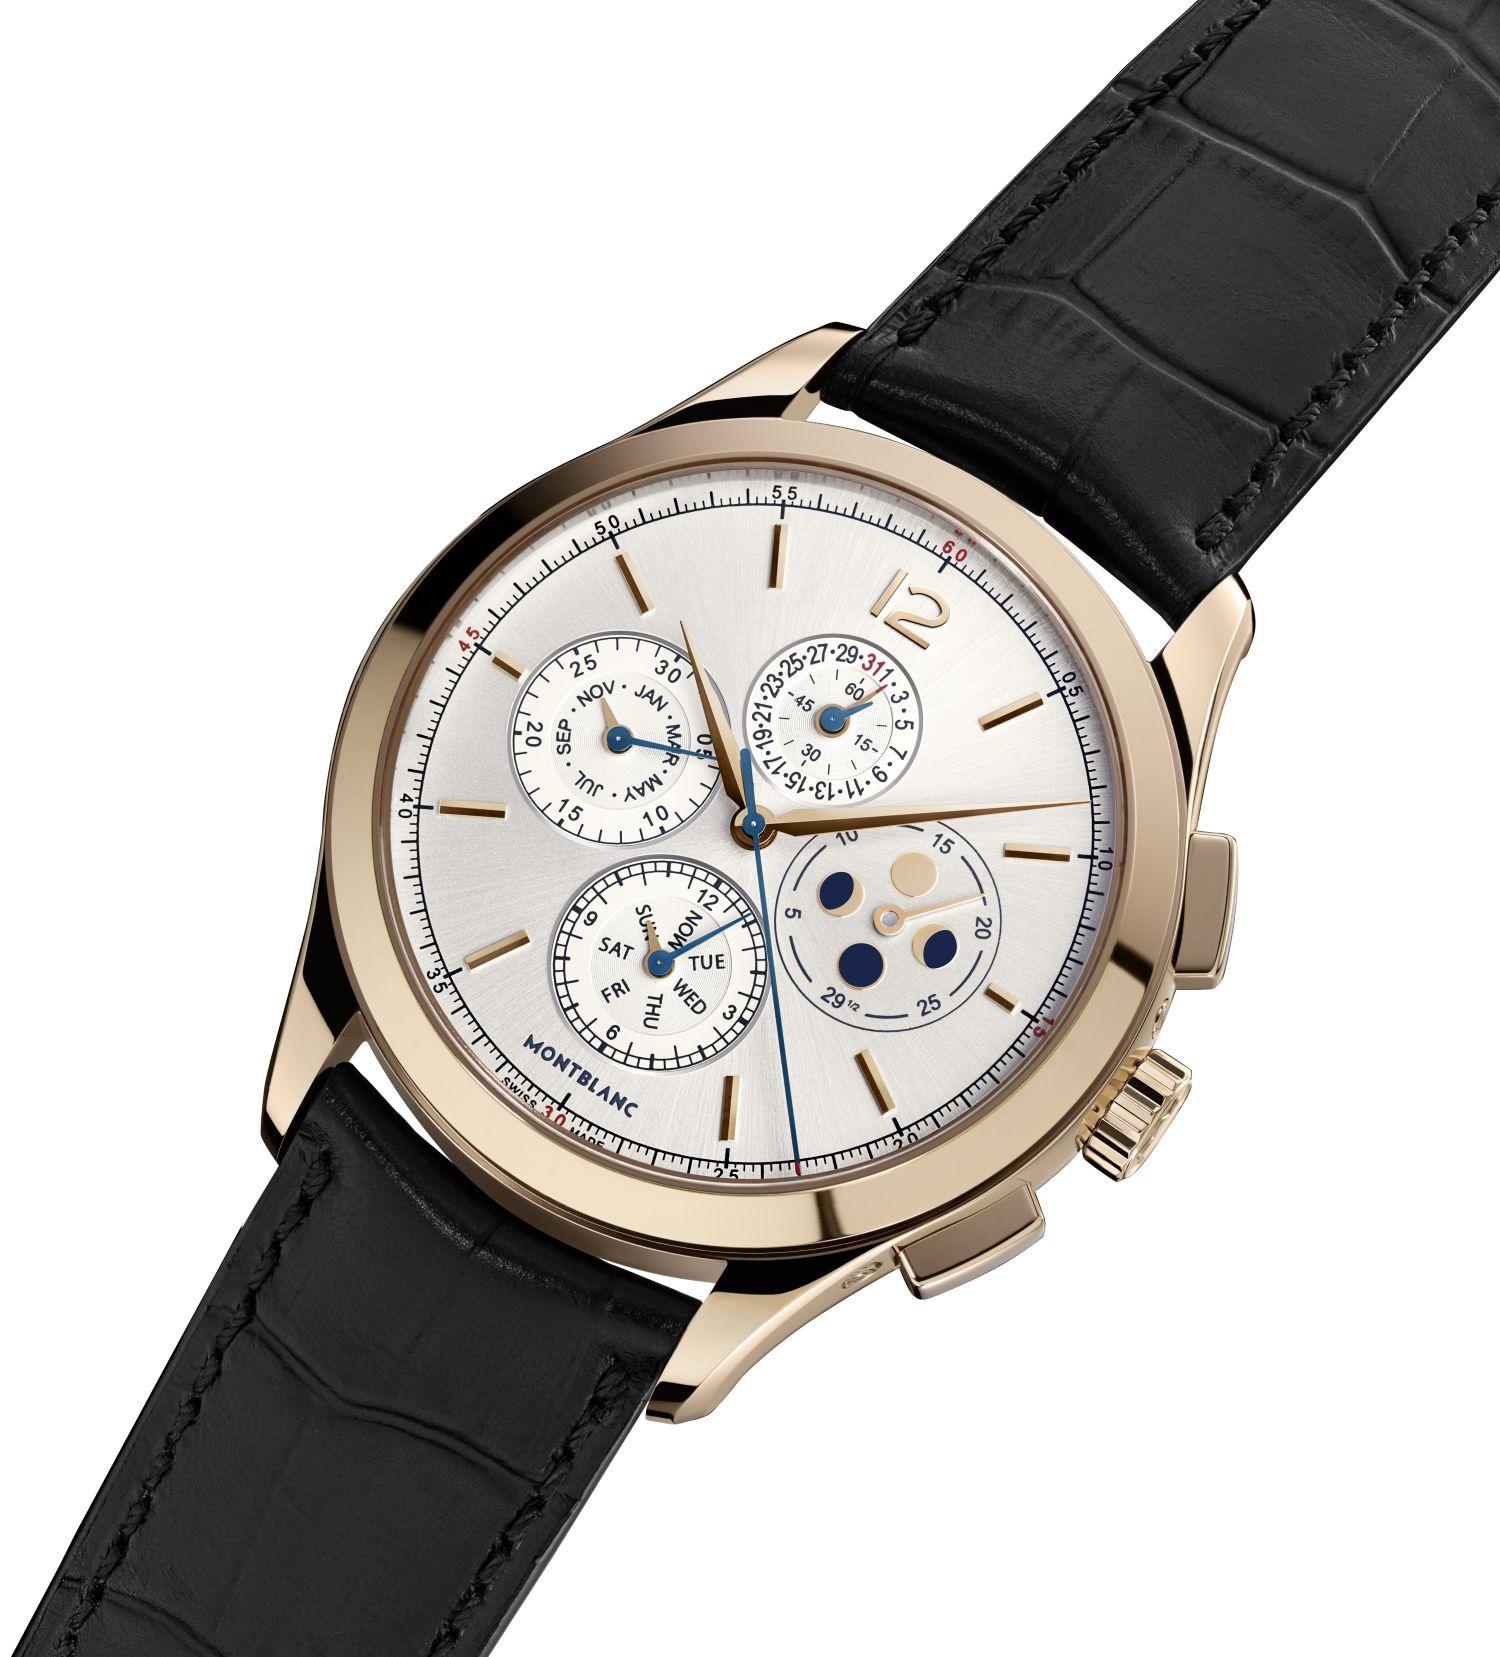 Montblanc-Heritage-Chronometrie-Chronograph-Quantiame-Annuel-2.jpg